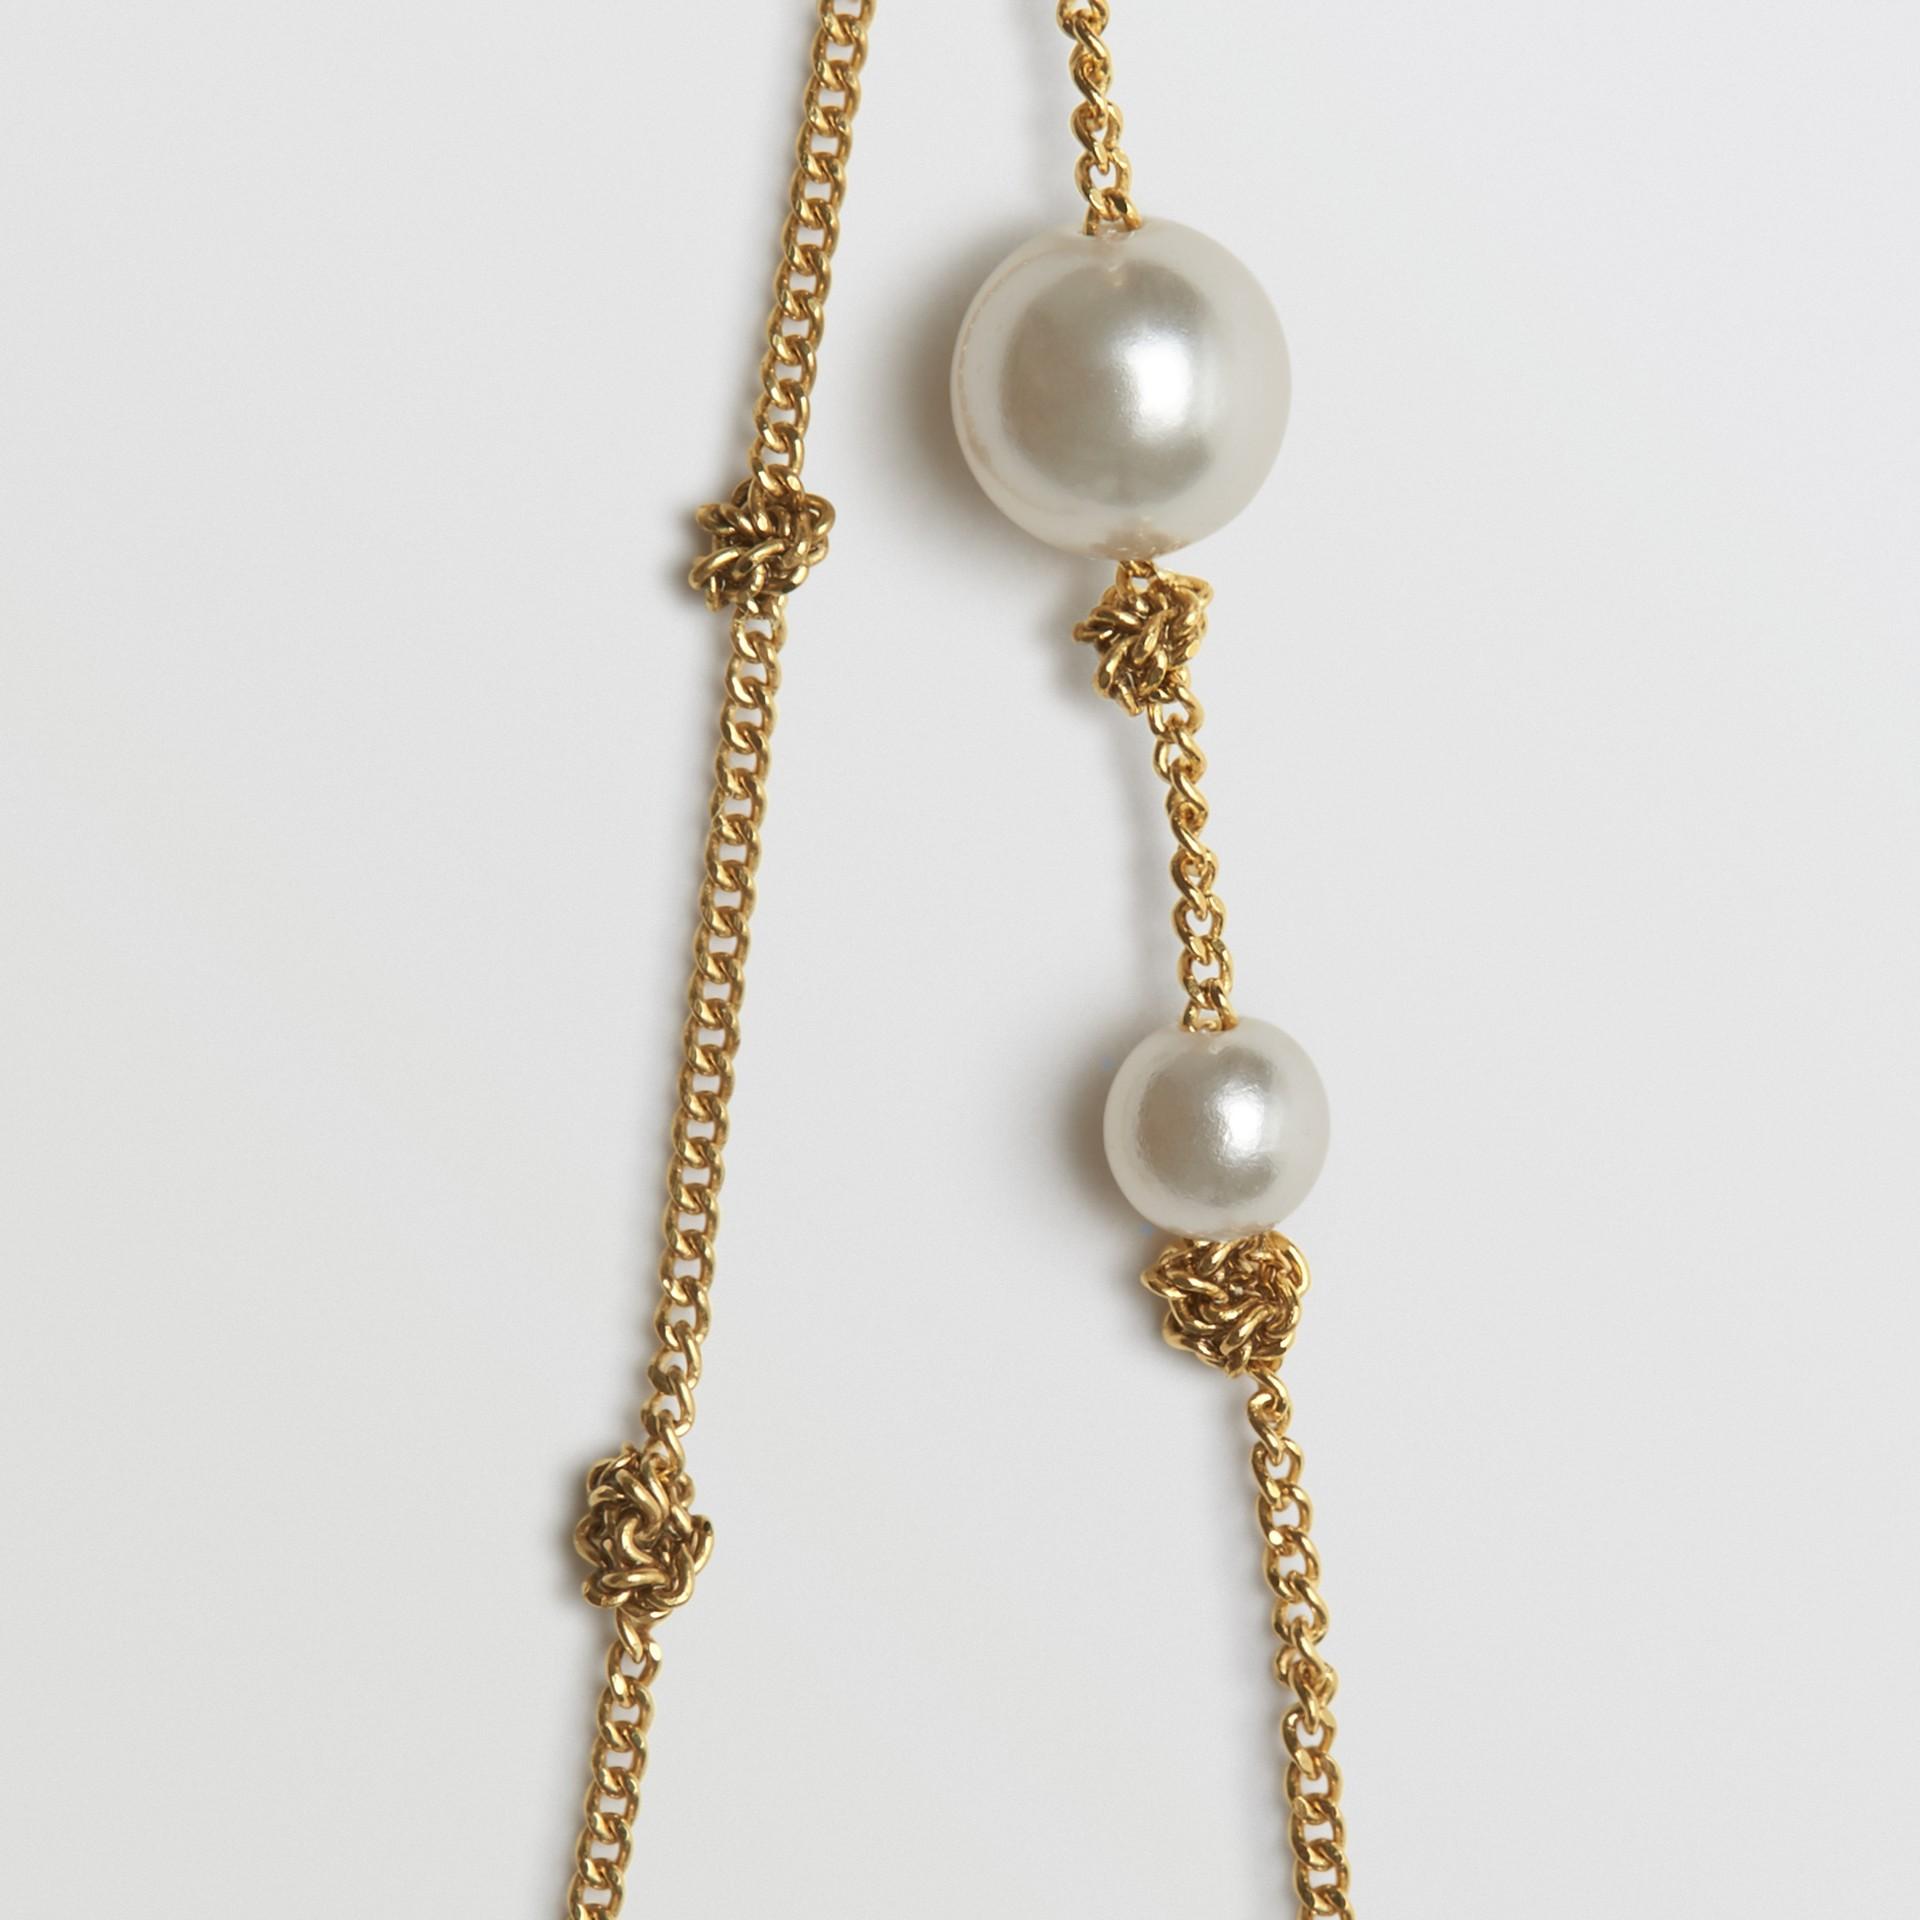 Vergoldete Chandelier-Ohrringe mit Schmuckperlen (Helles Goldfarben) - Damen | Burberry - Galerie-Bild 2